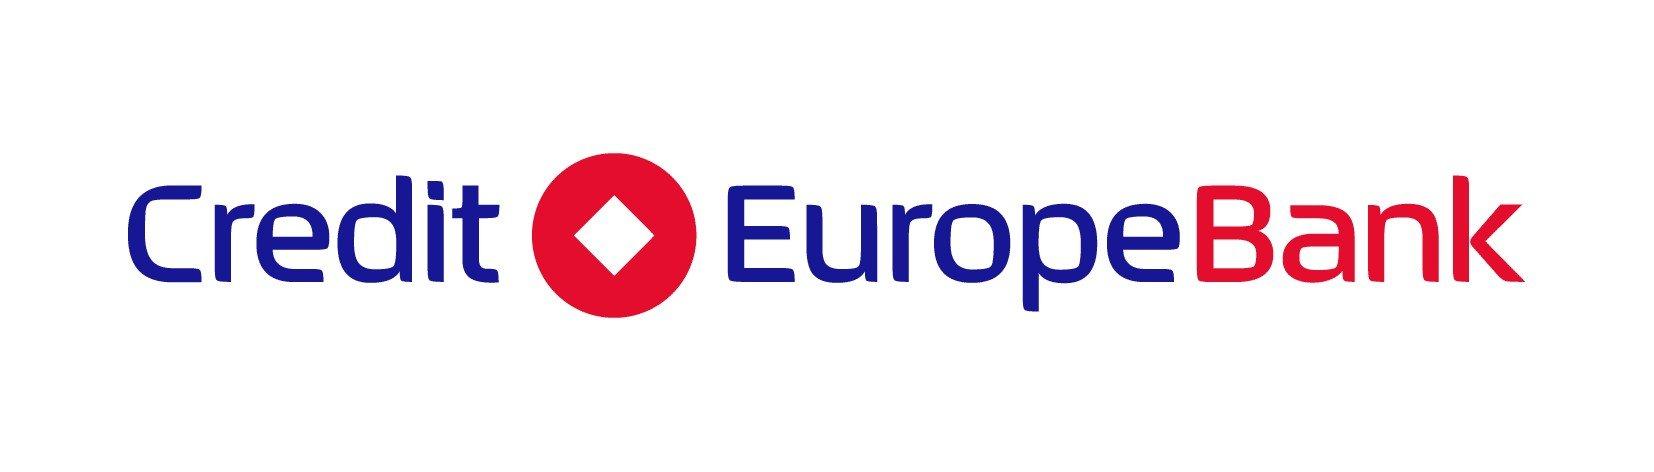 Credit europe bank online kredit